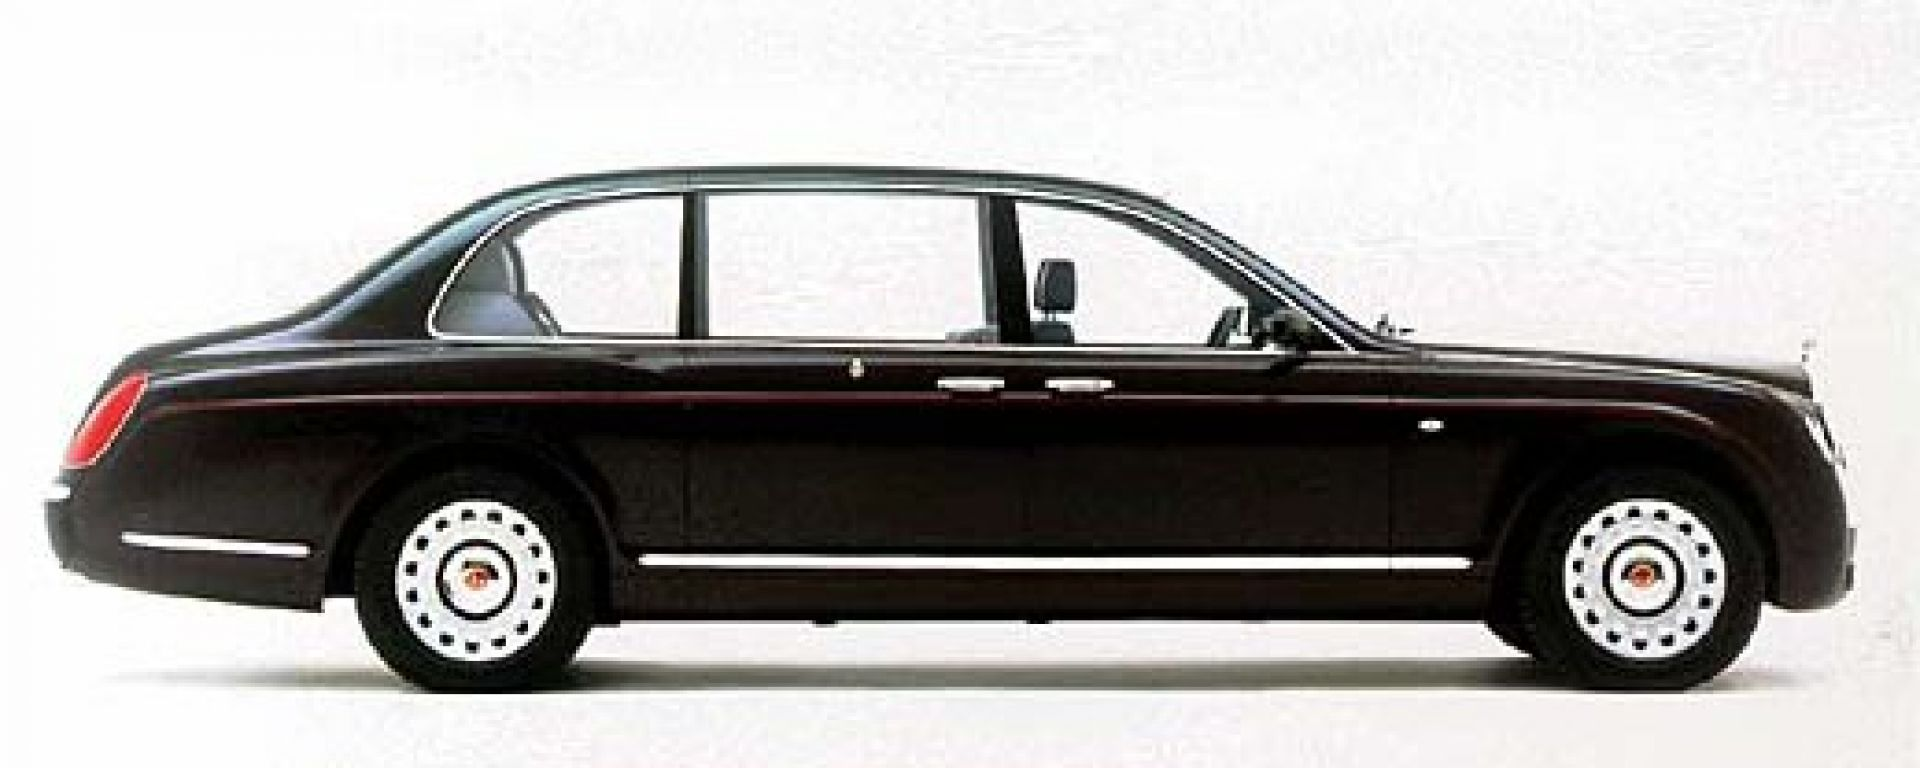 La Bentley della Regina